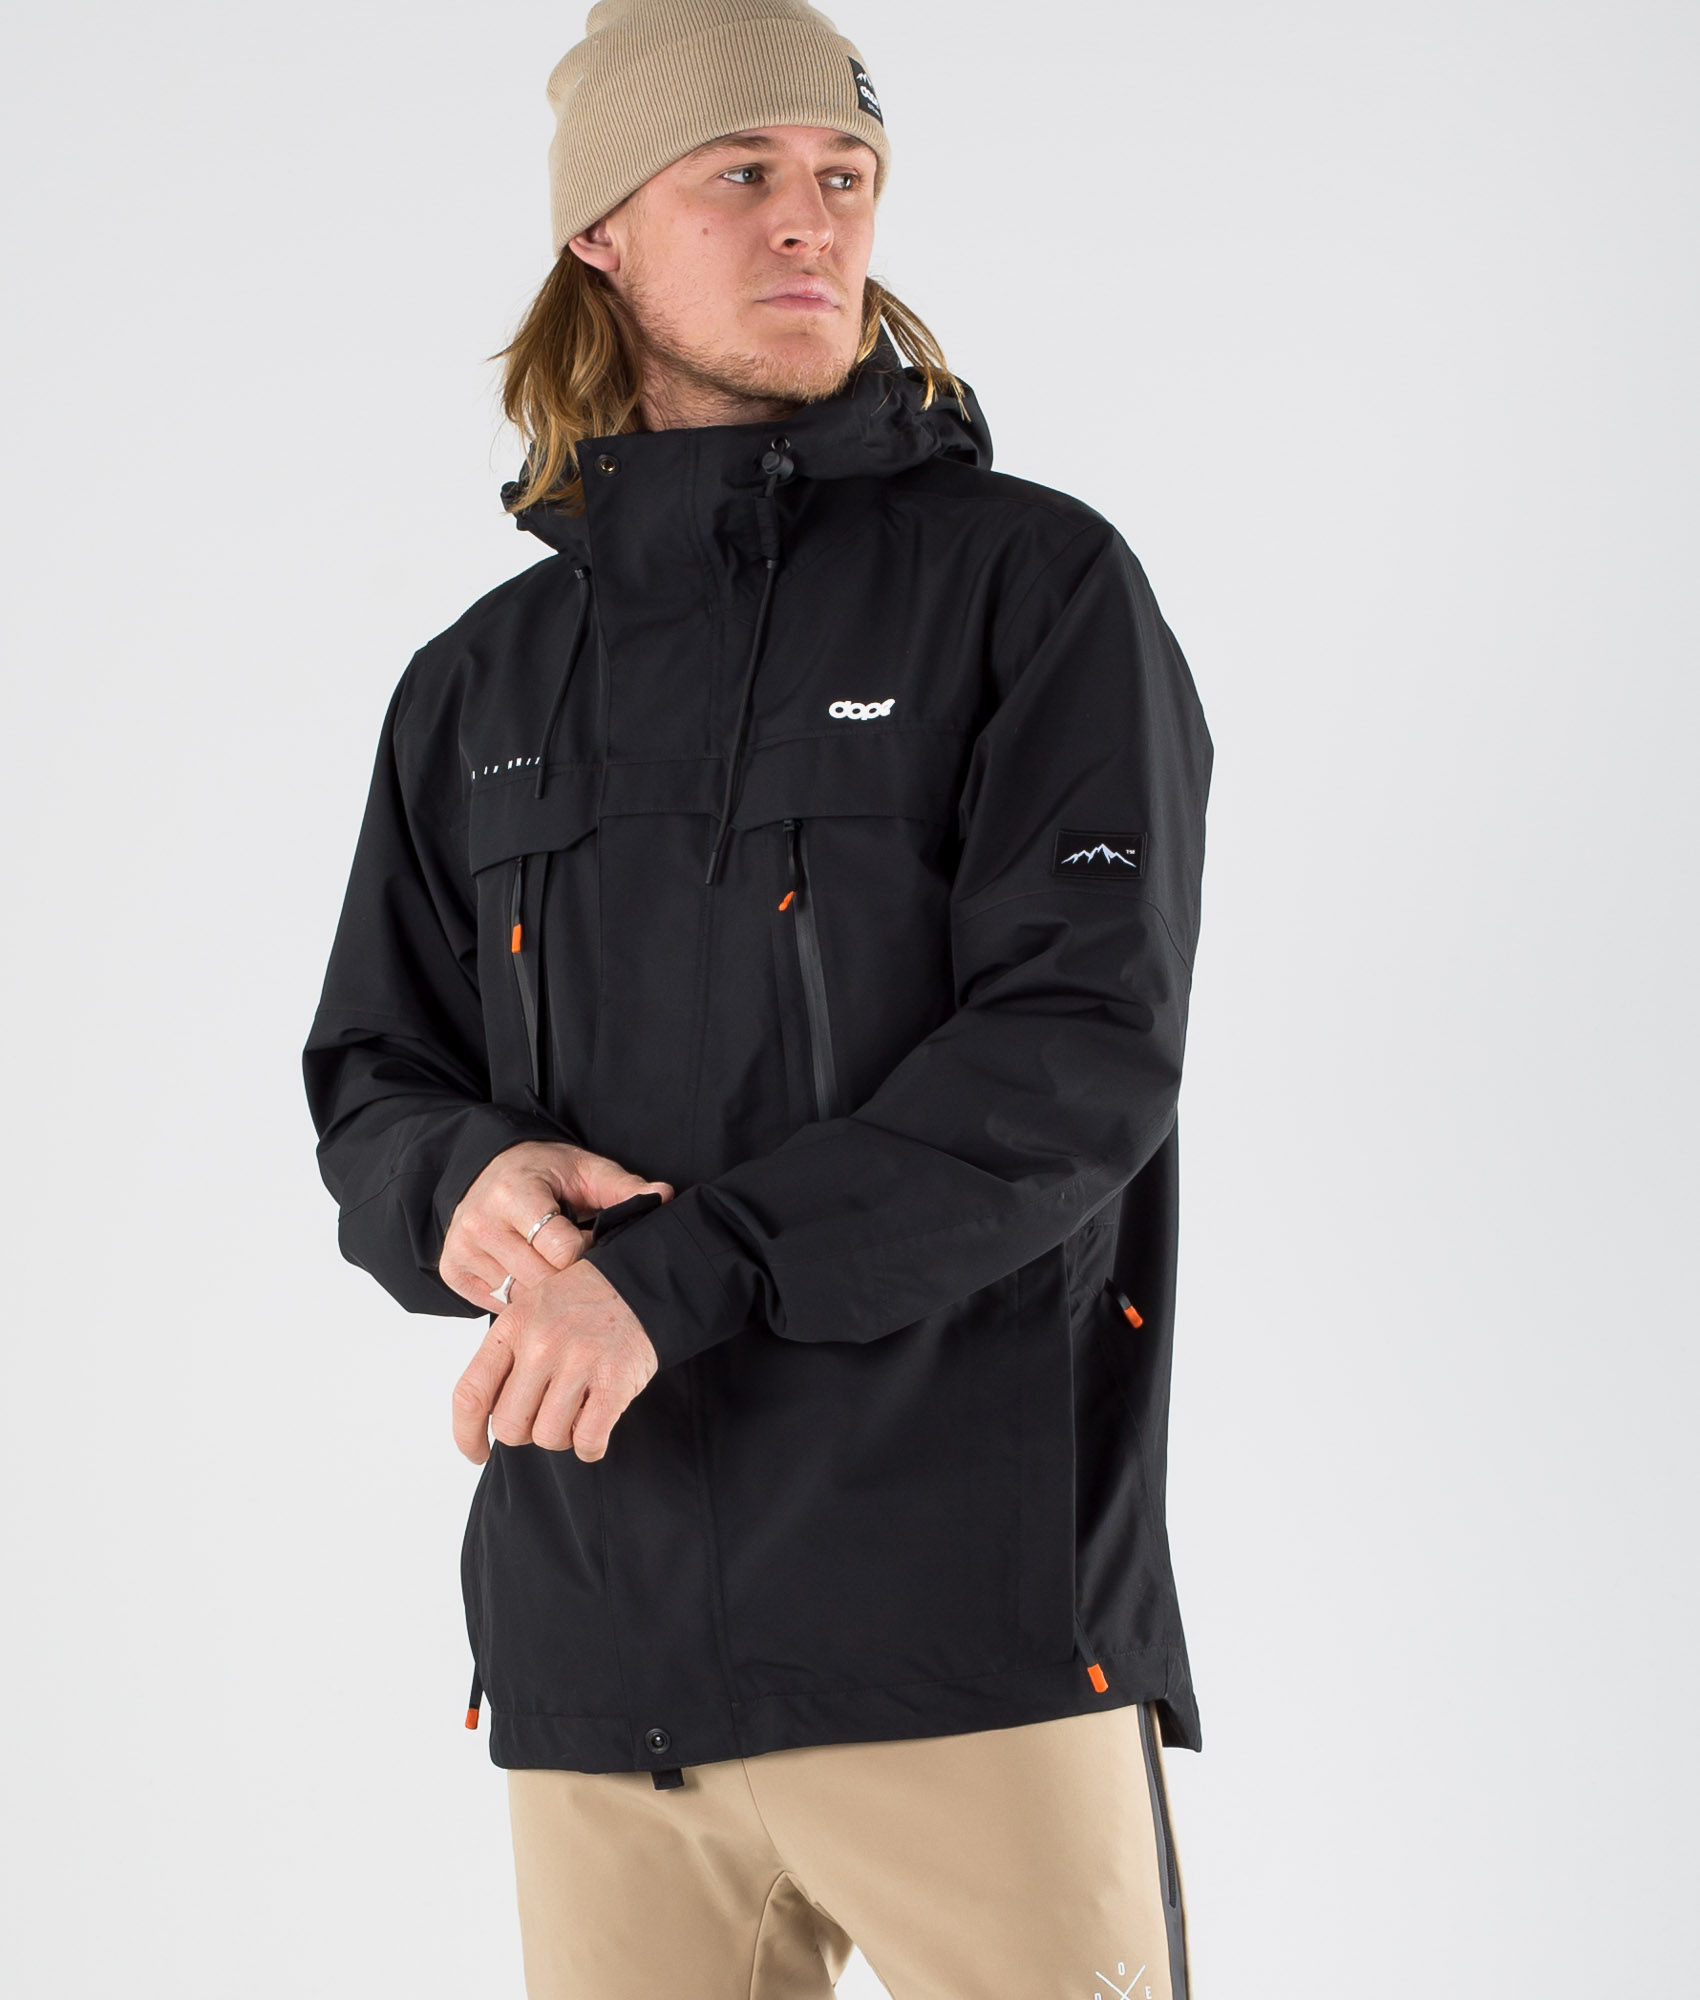 Jackor Herr Streetwear | Fri Frakt | Ridestore.se